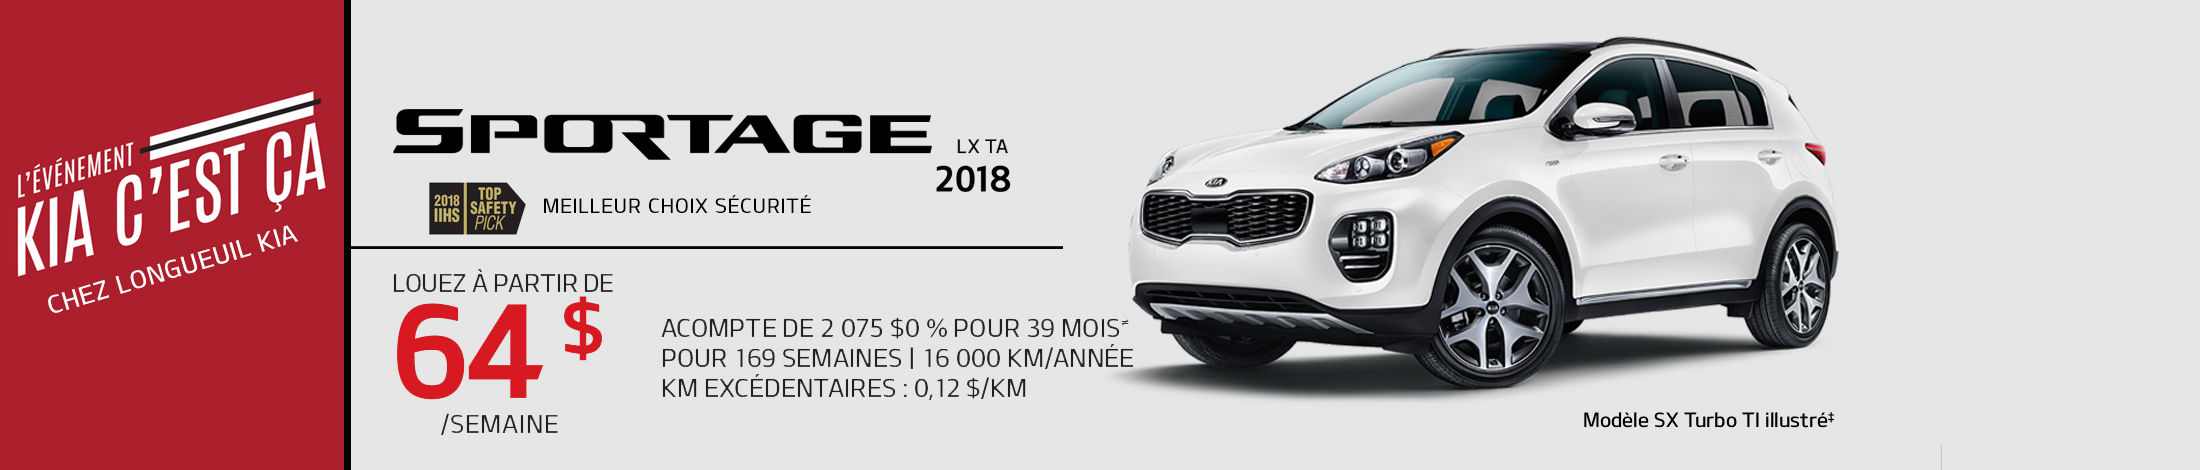 Kia Sportage  Promotion mars banner